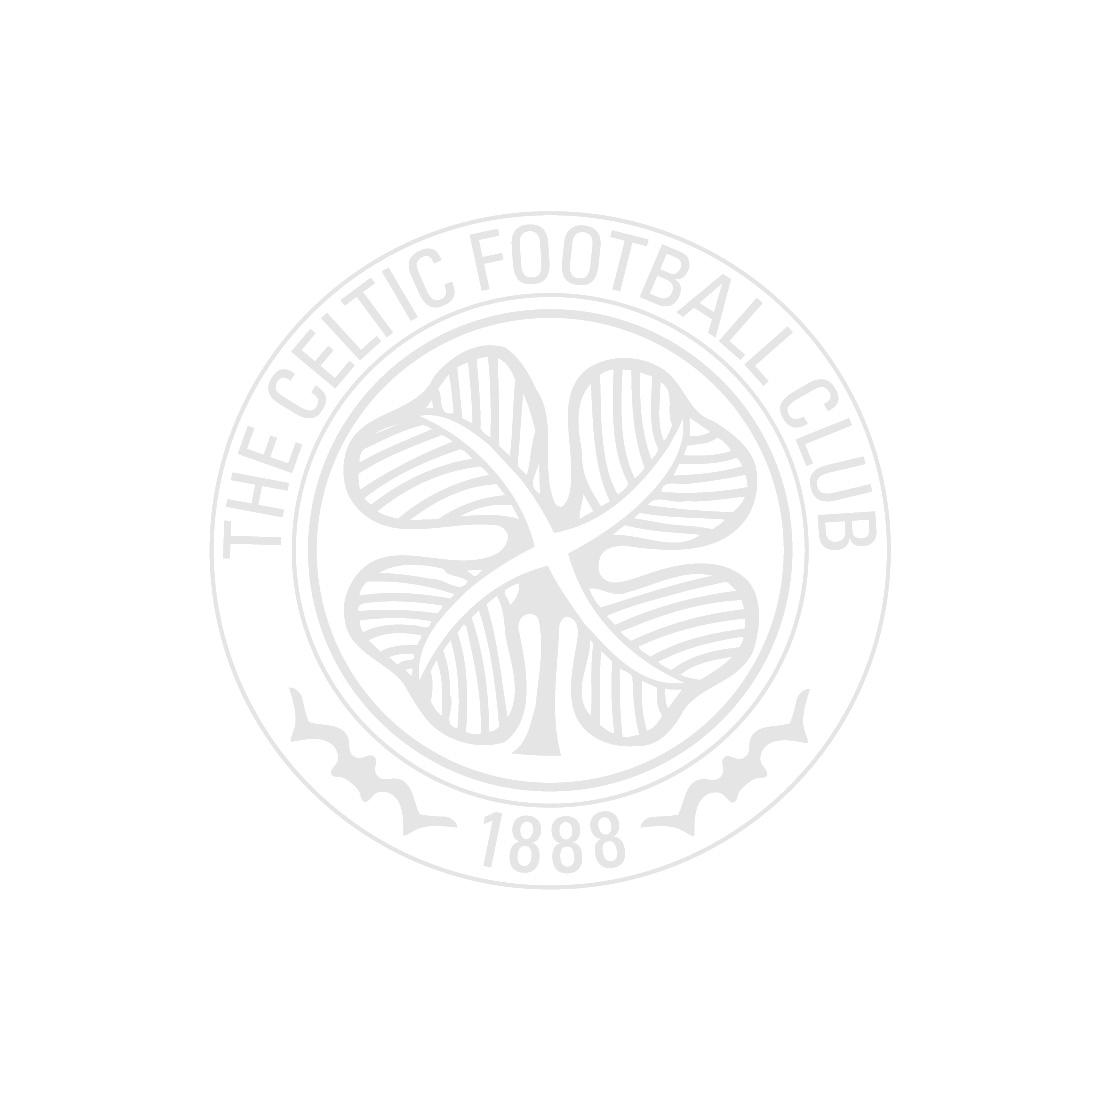 Celtic 2018/19 Team Poster